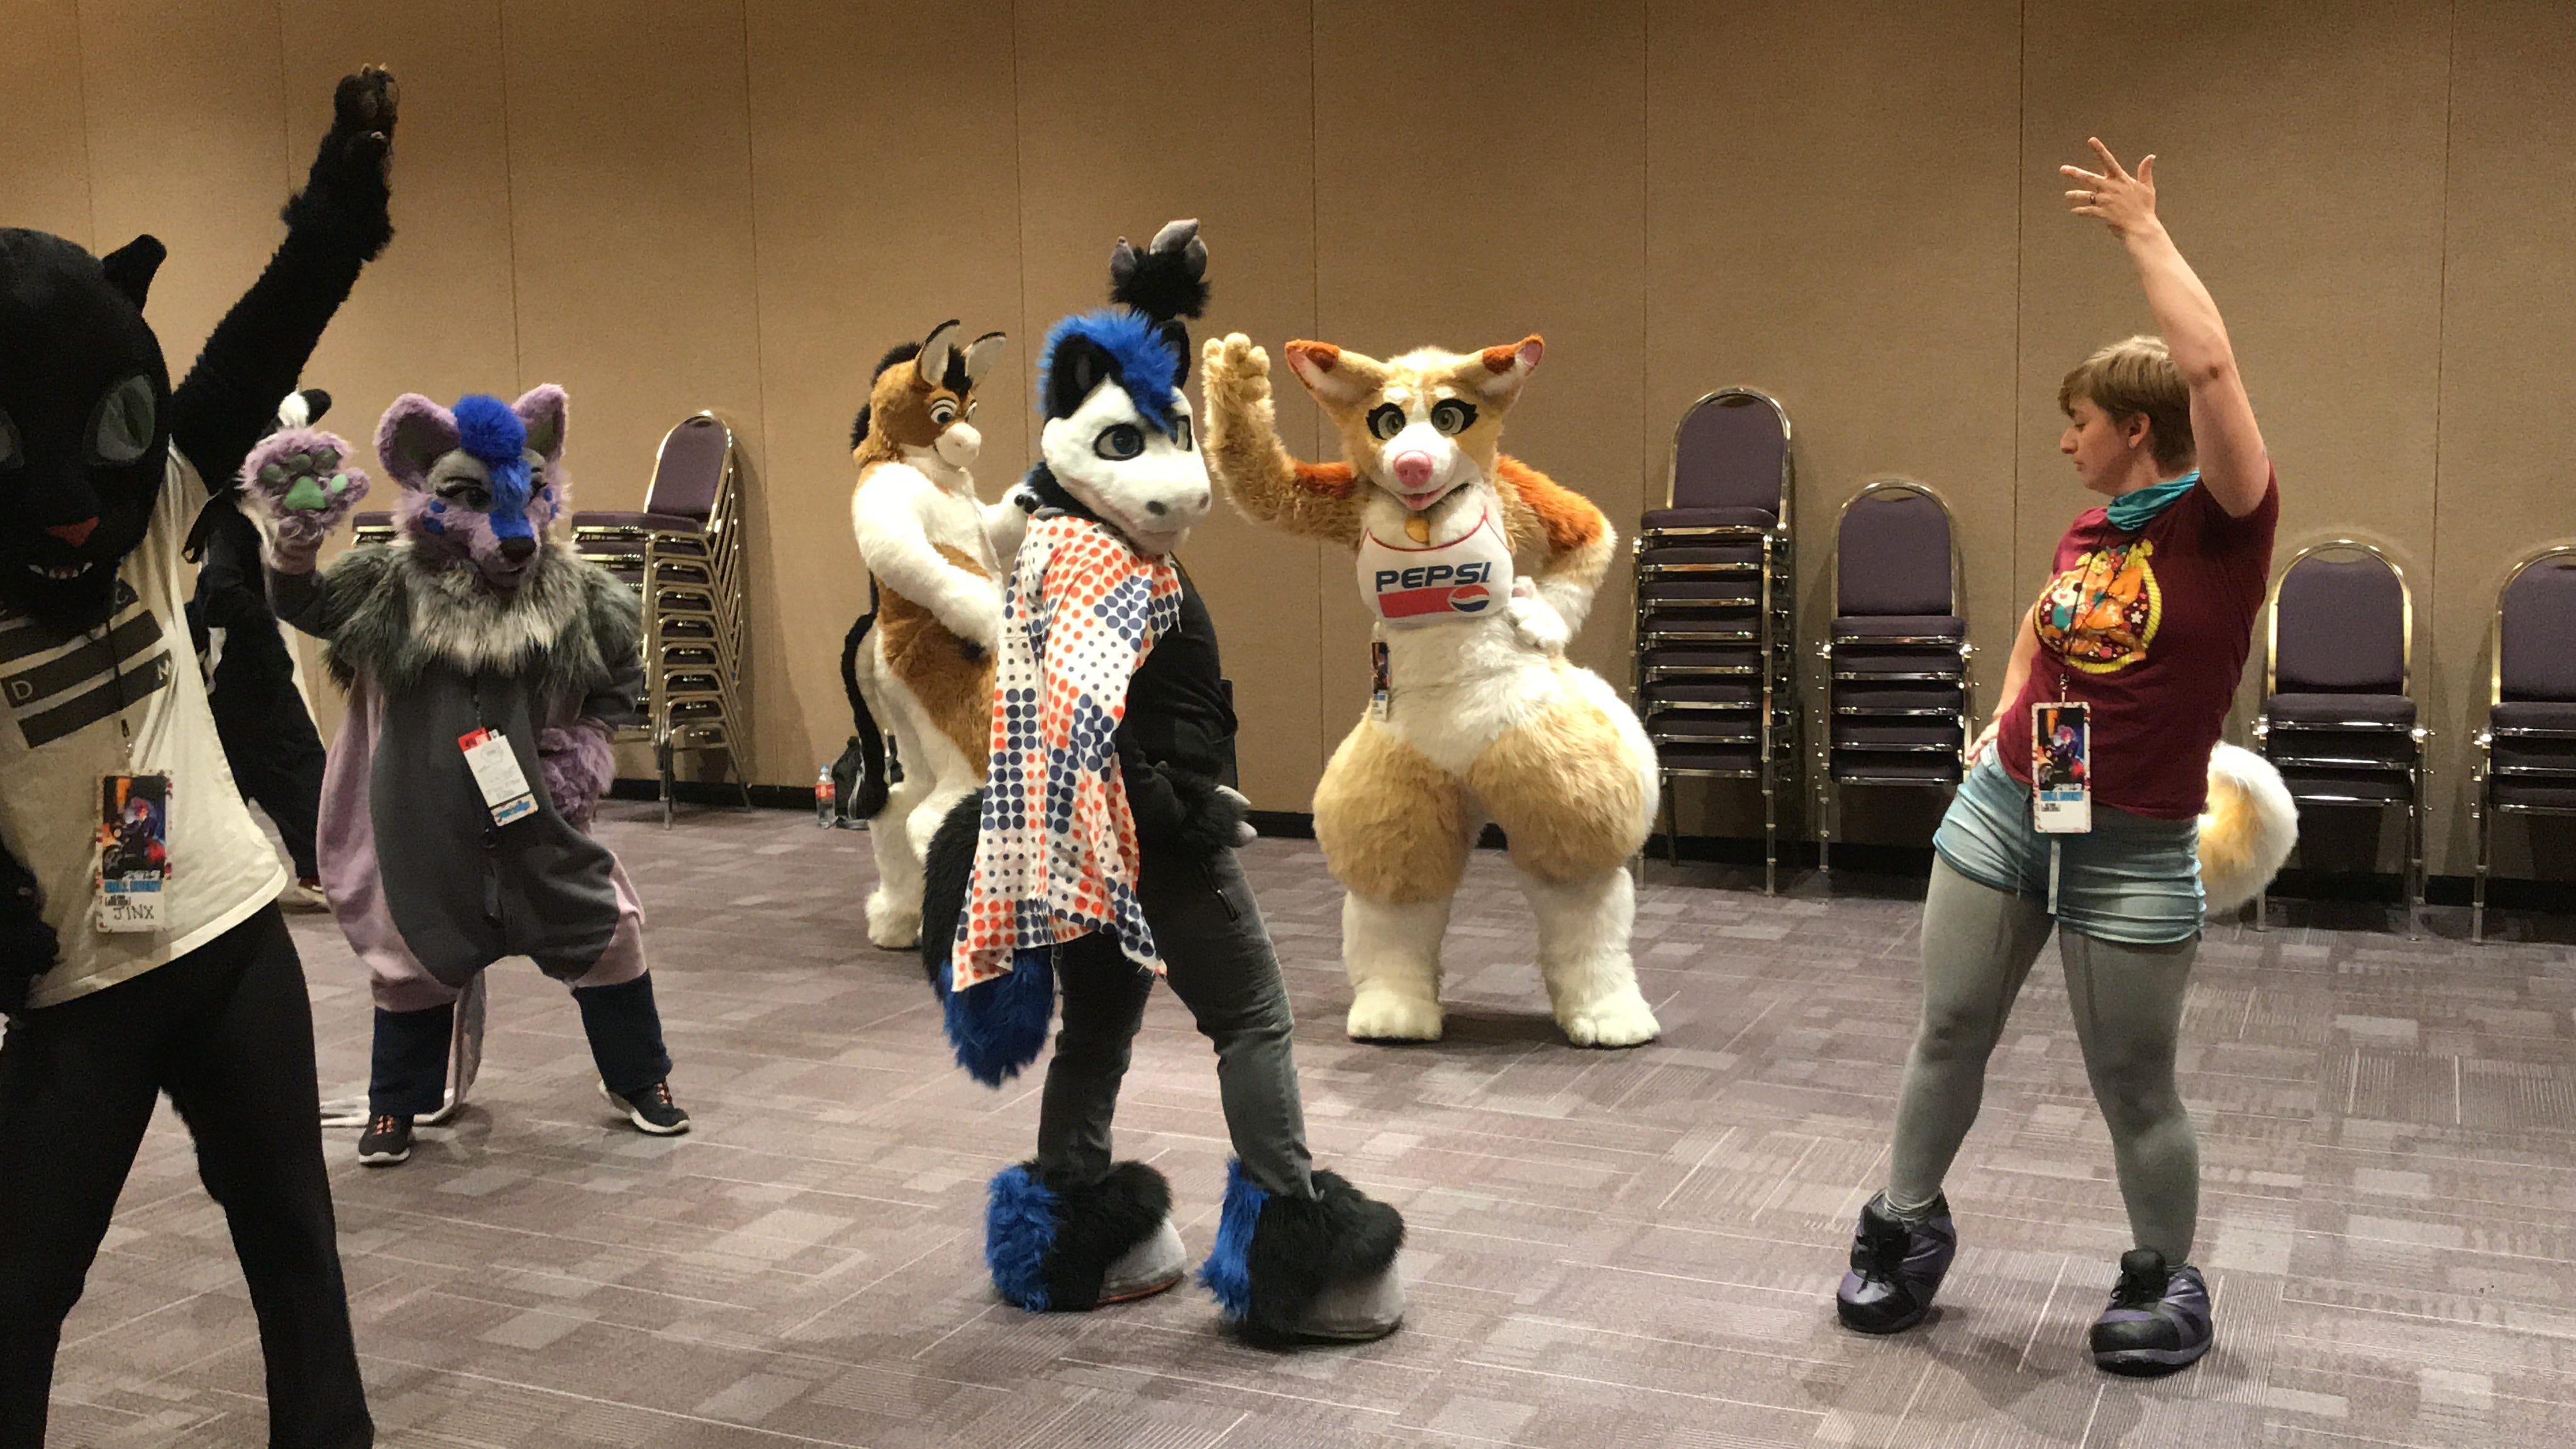 Halloween Furries Convention 2020 Arizona Fur Con mixes art and creativity in Mesa